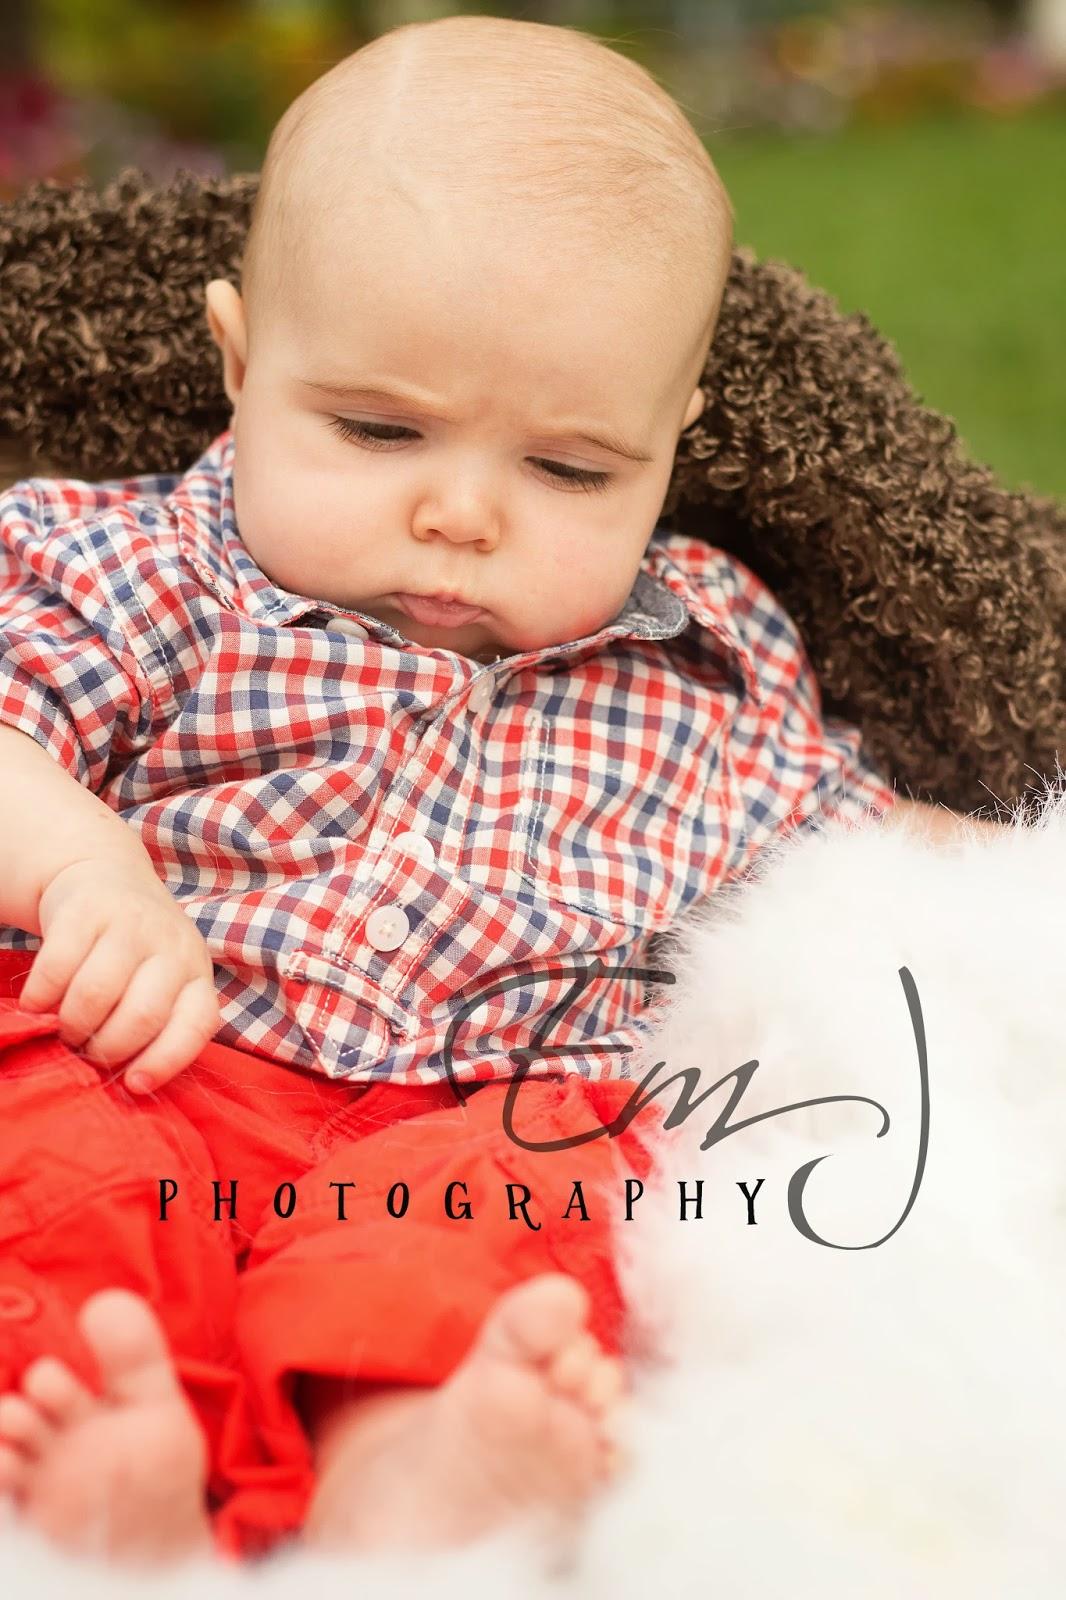 squishy, chubby baby cheeks! - em j photography